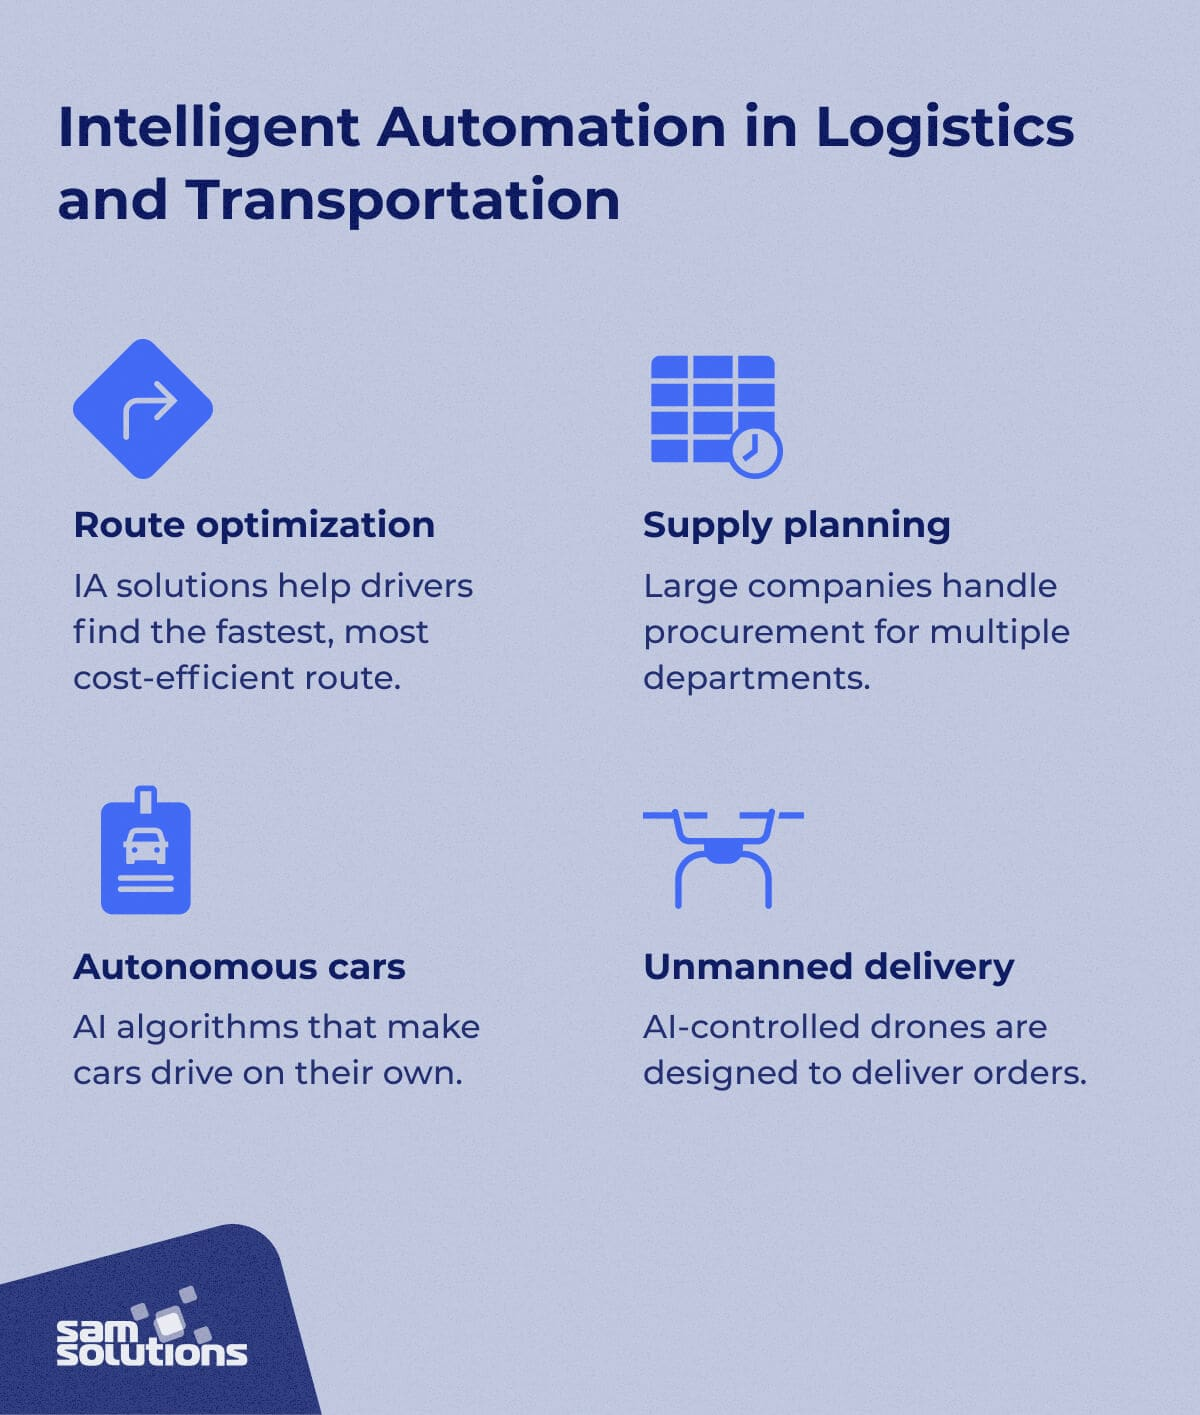 Intelligent-Automation-IA-Logistics-image